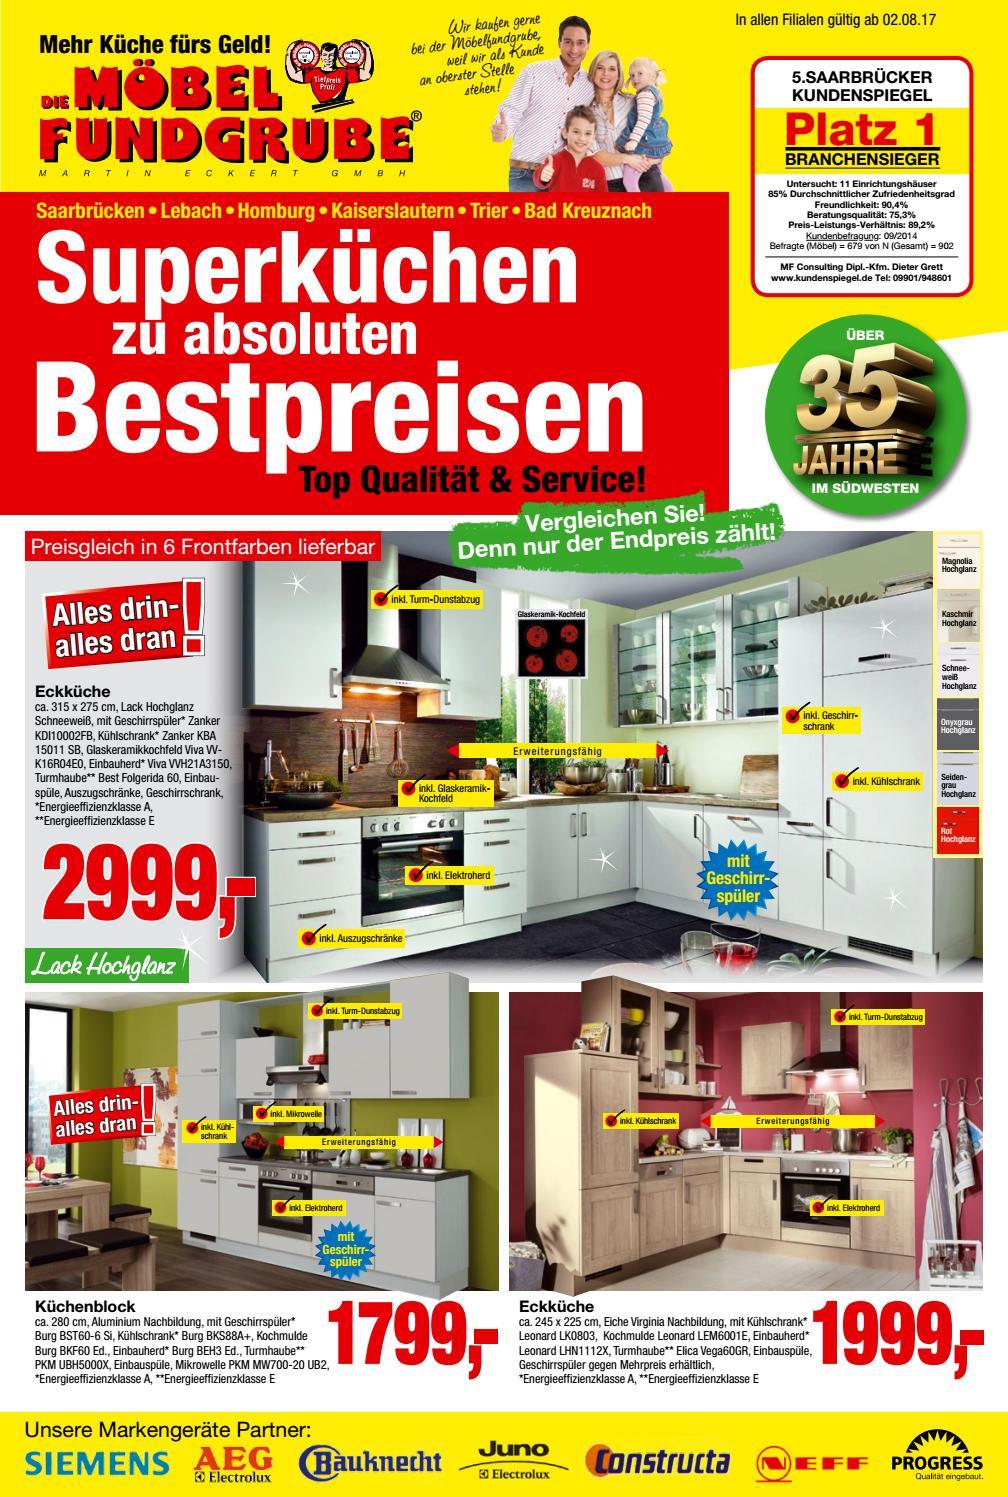 Möbel Fundgrube Küchenprospekt Kw 31 By Die Möbelfundgrube ... à Moebel Fundgrube